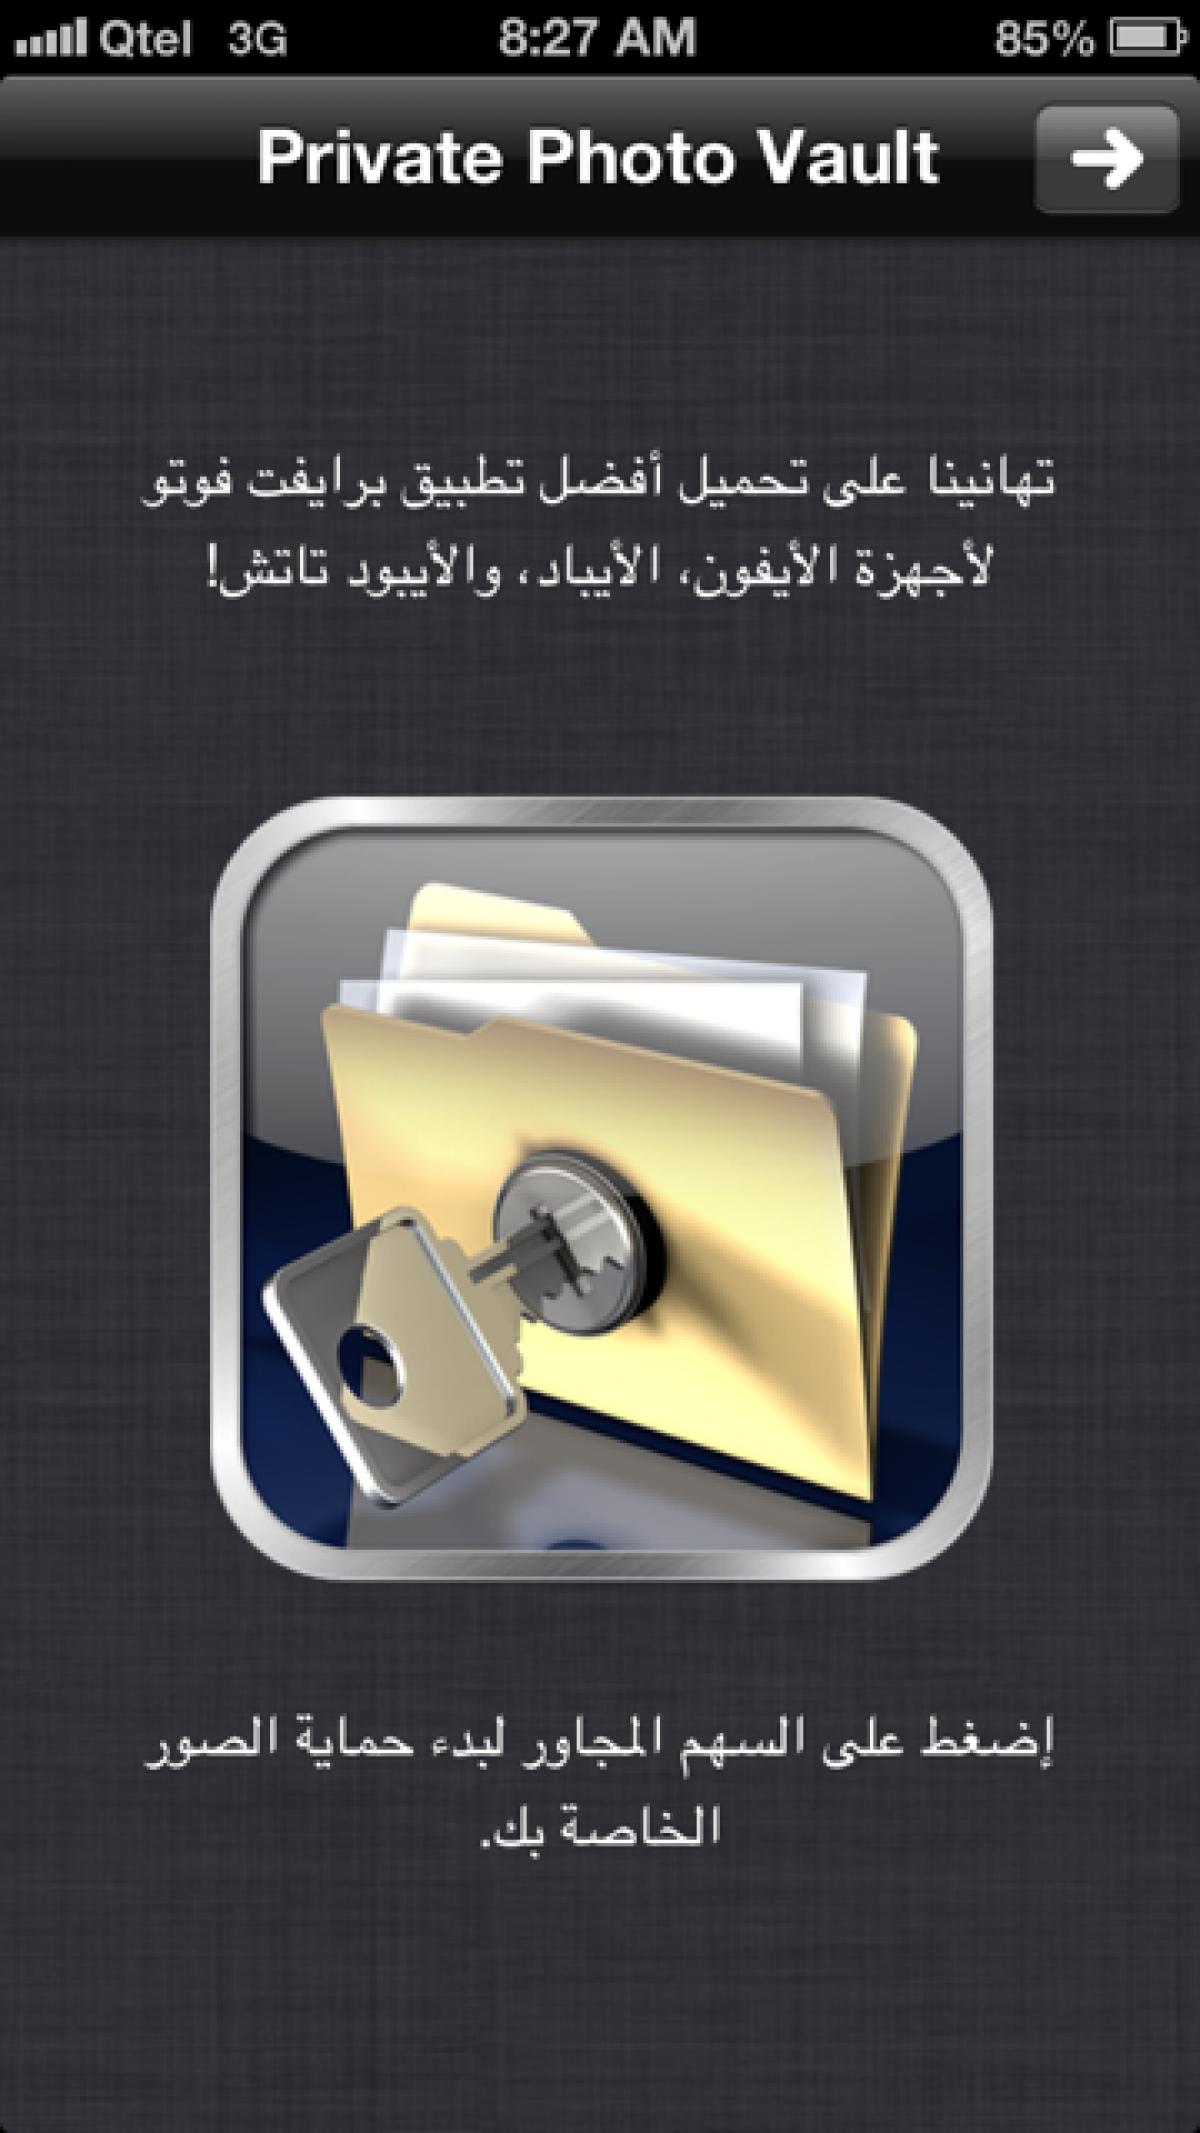 برنامج قفل الصور للايفون Private Photo Vault برامجنا